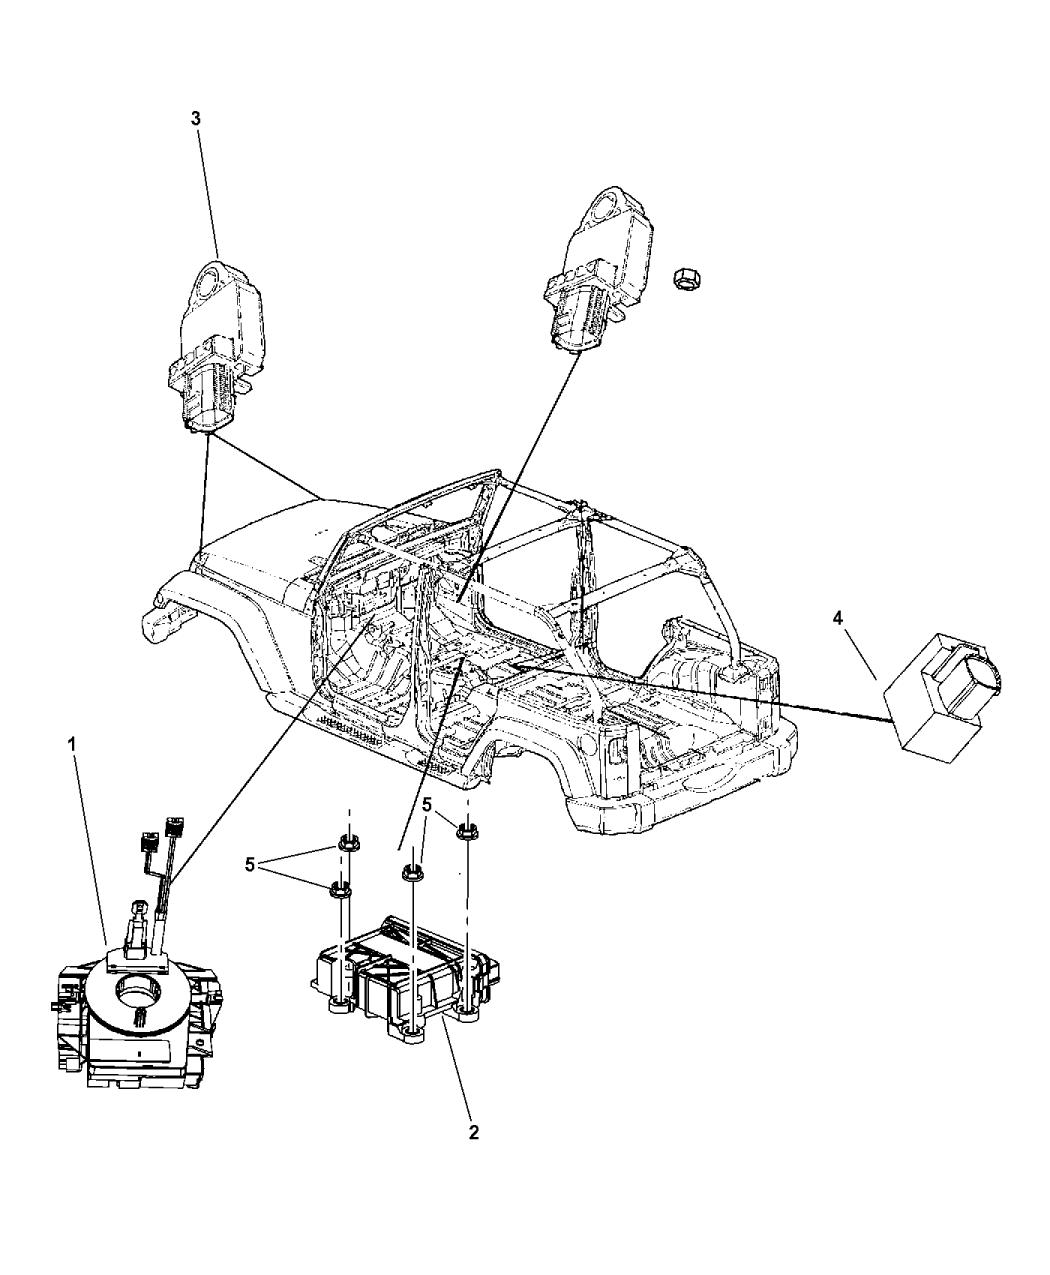 68003216ad Genuine Mopar Clksprng Steering Column Control Mod 2008 Jeep Wrangler Engine Diagram Air Bag Modules Impact Sensor Clock Springs